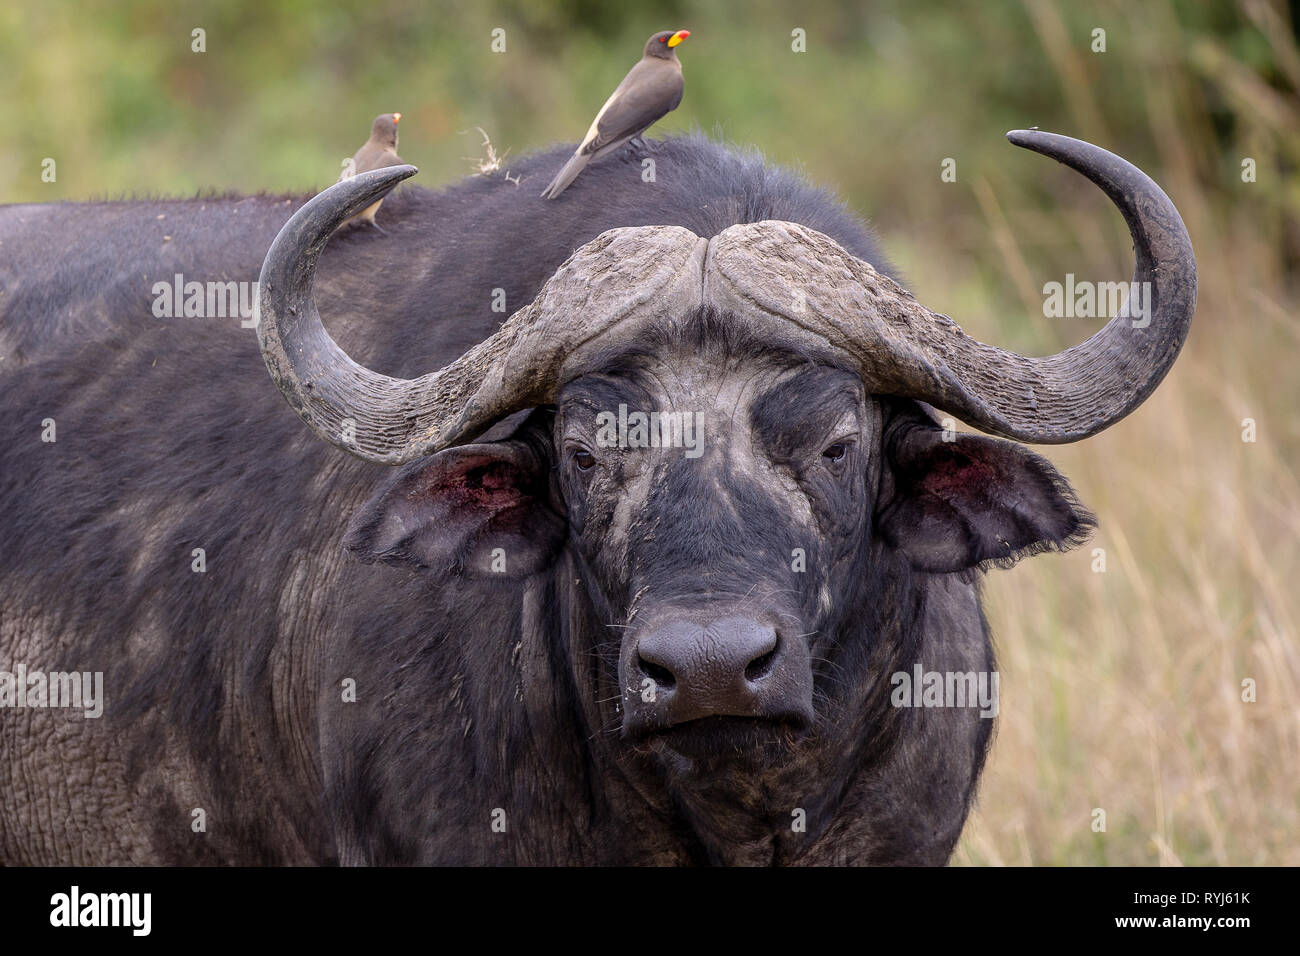 e52c628dd Angry Buffalo Stock Photos & Angry Buffalo Stock Images - Alamy